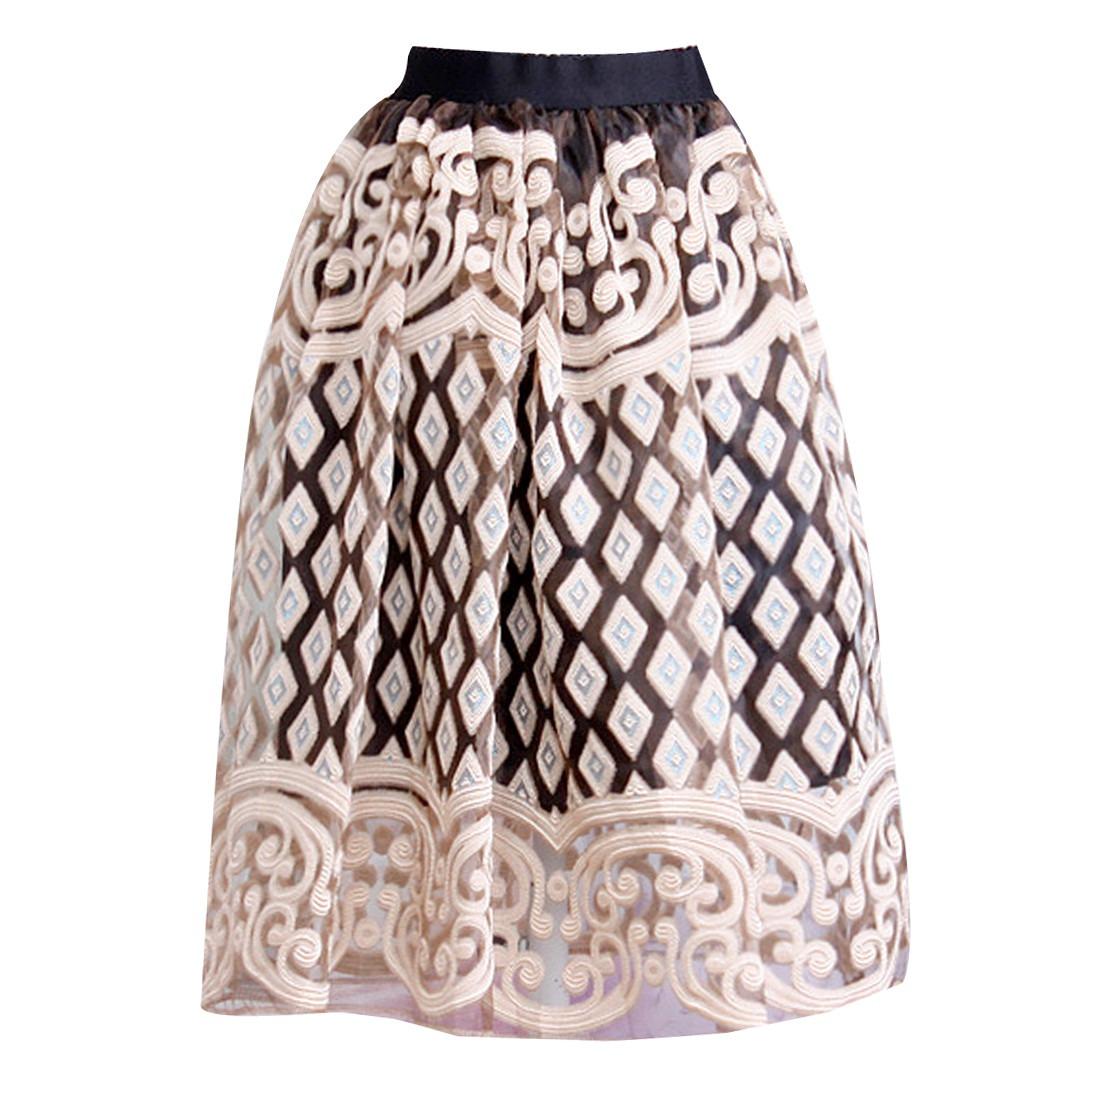 Women Organza Embroidery High Waist Pleated Vintage Style Midi Tulle Skirts